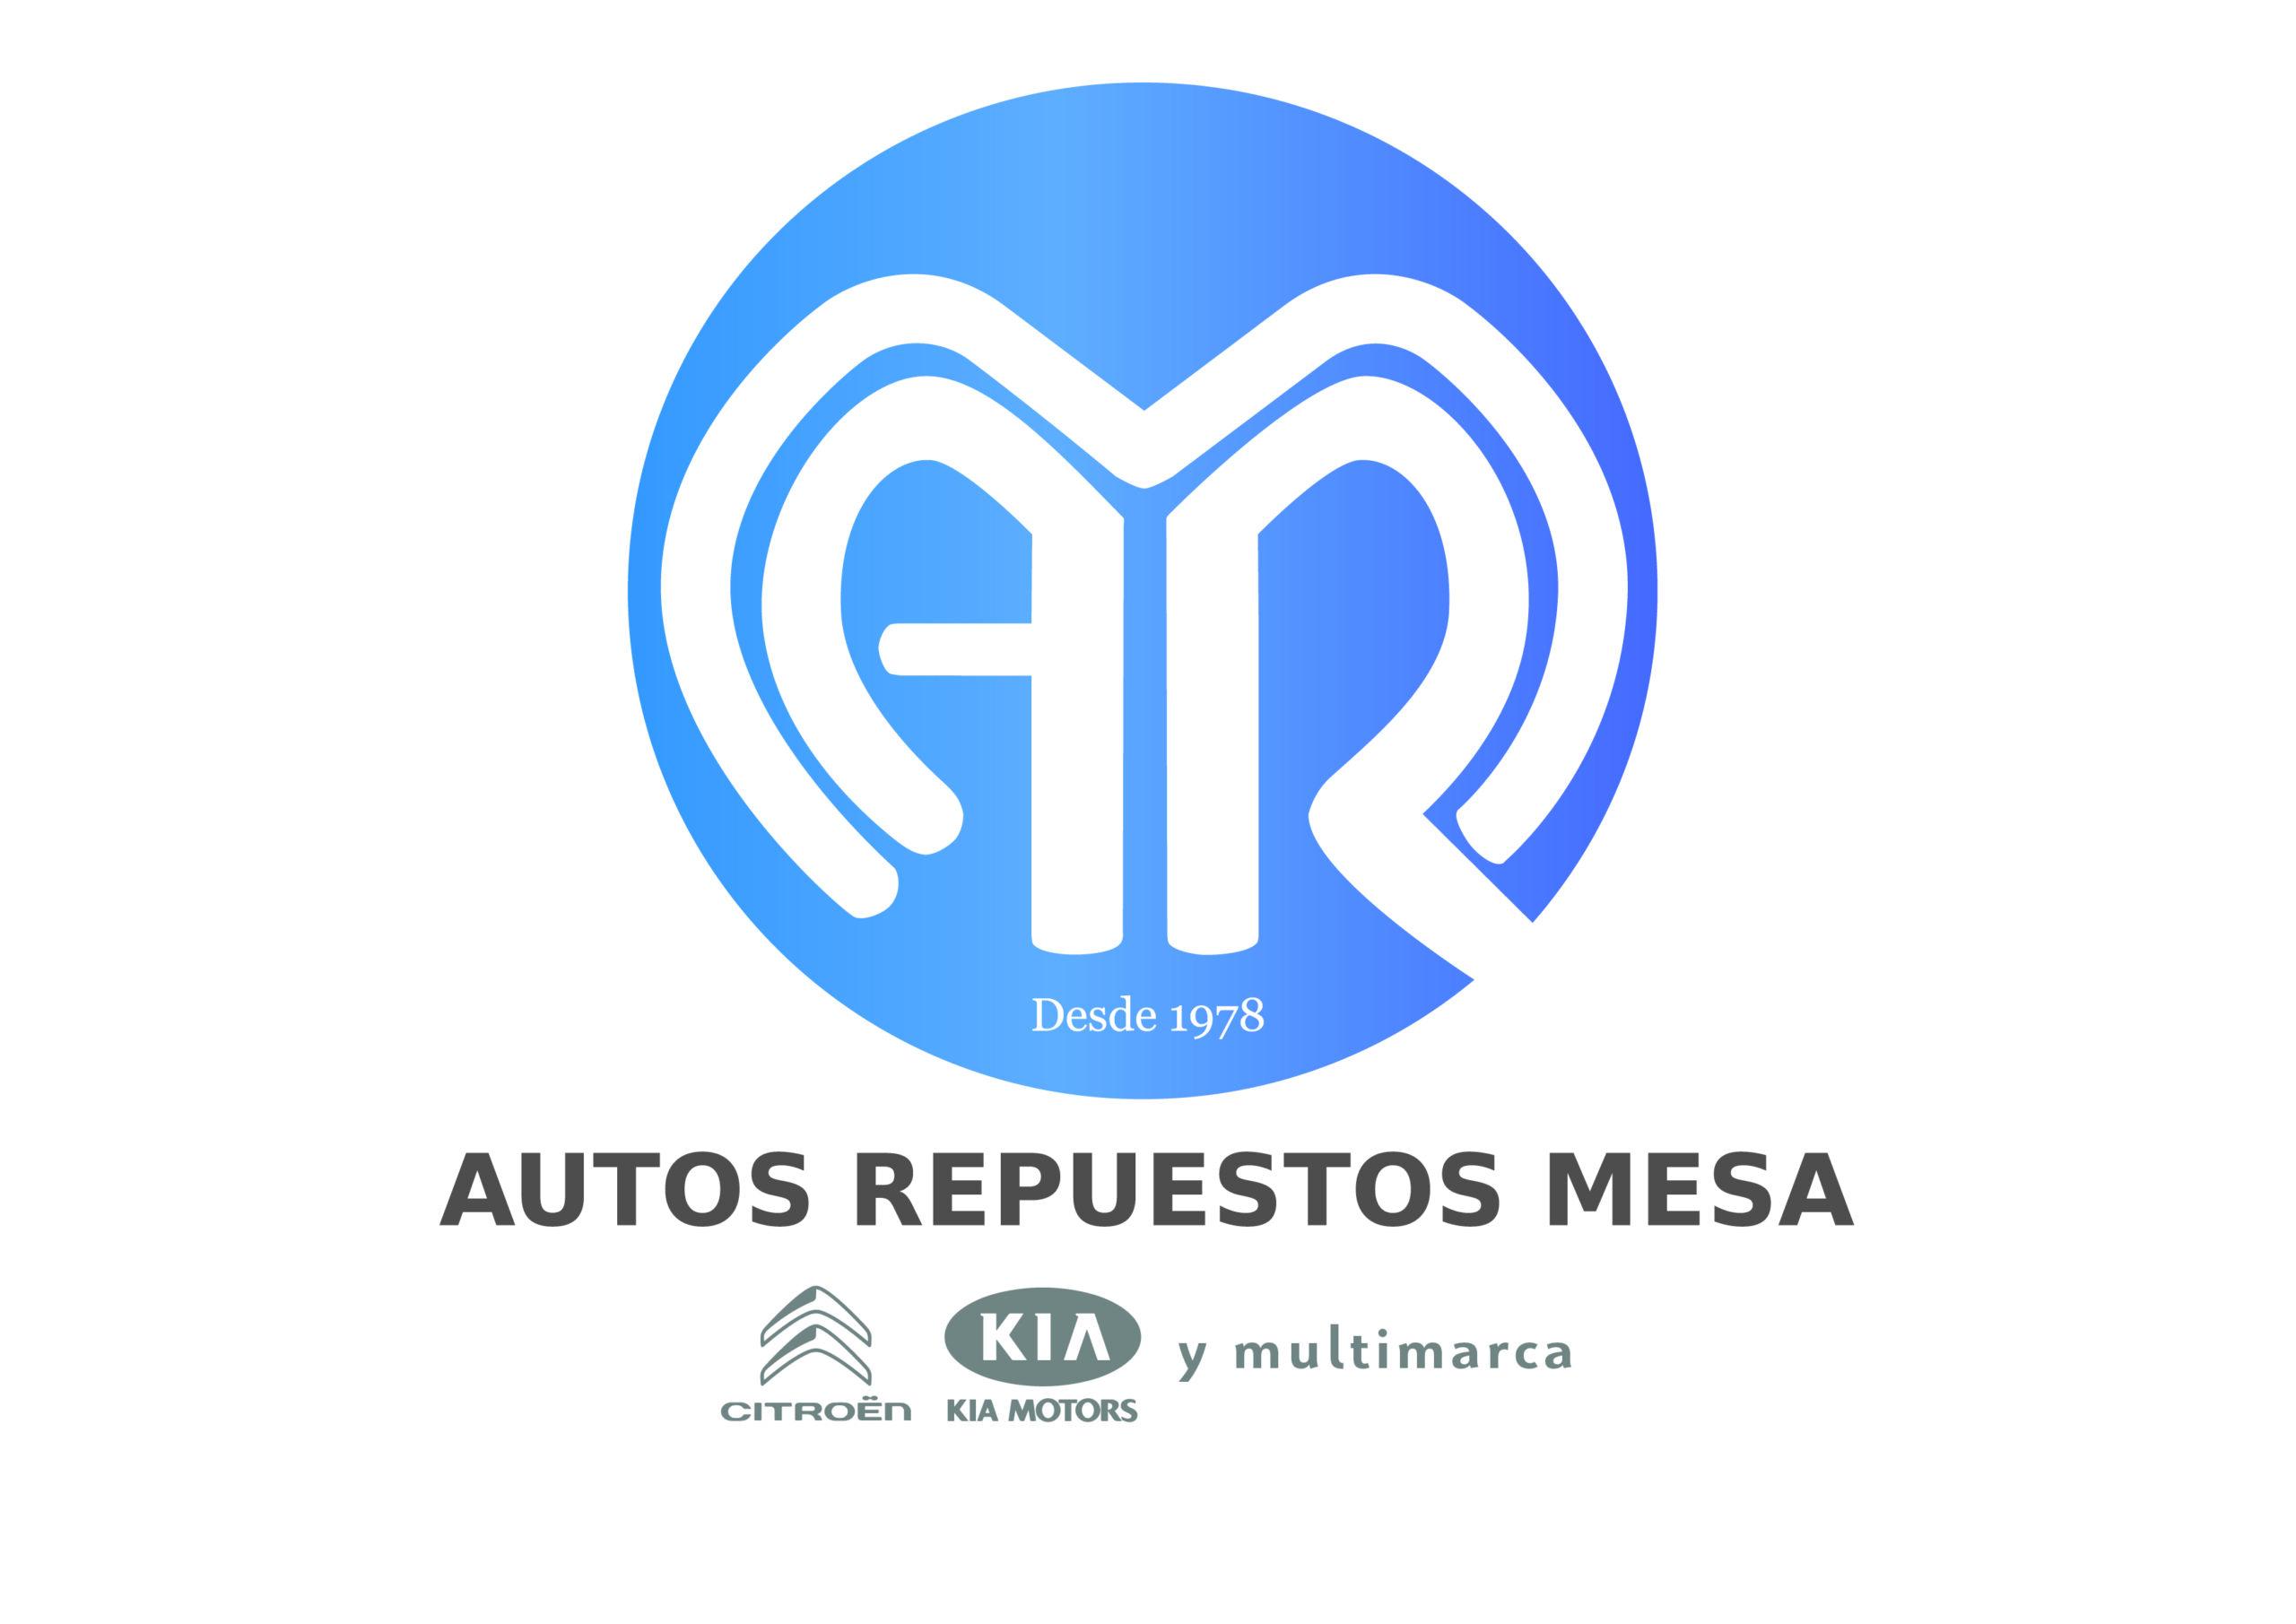 Recambios Citroën Tenerife